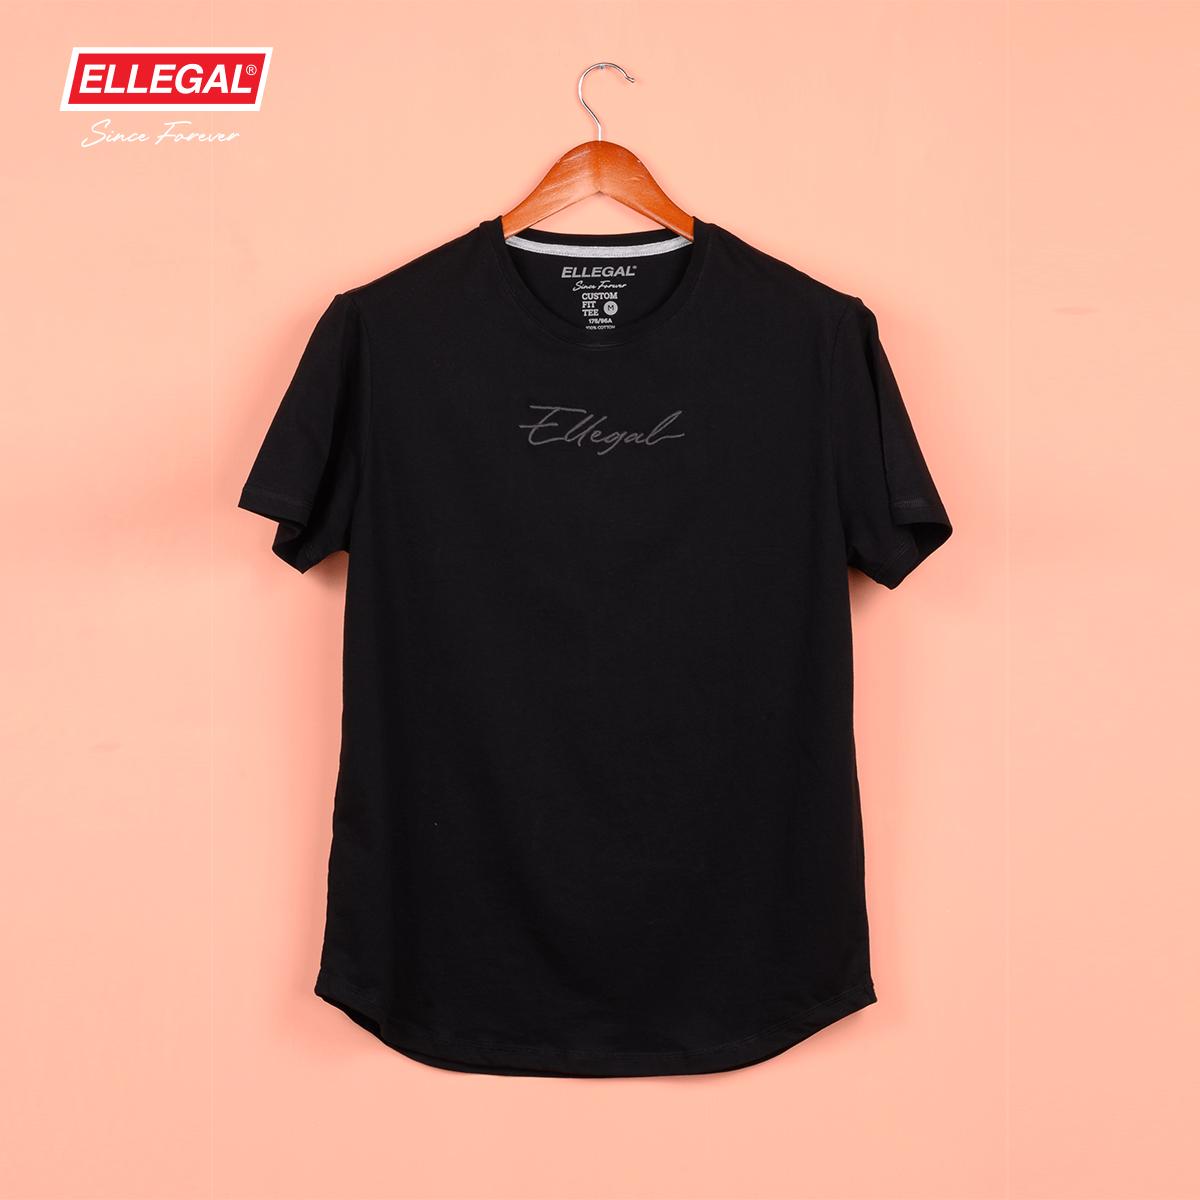 Ellegal Tee Shirts Add a Distinct Style Statement!